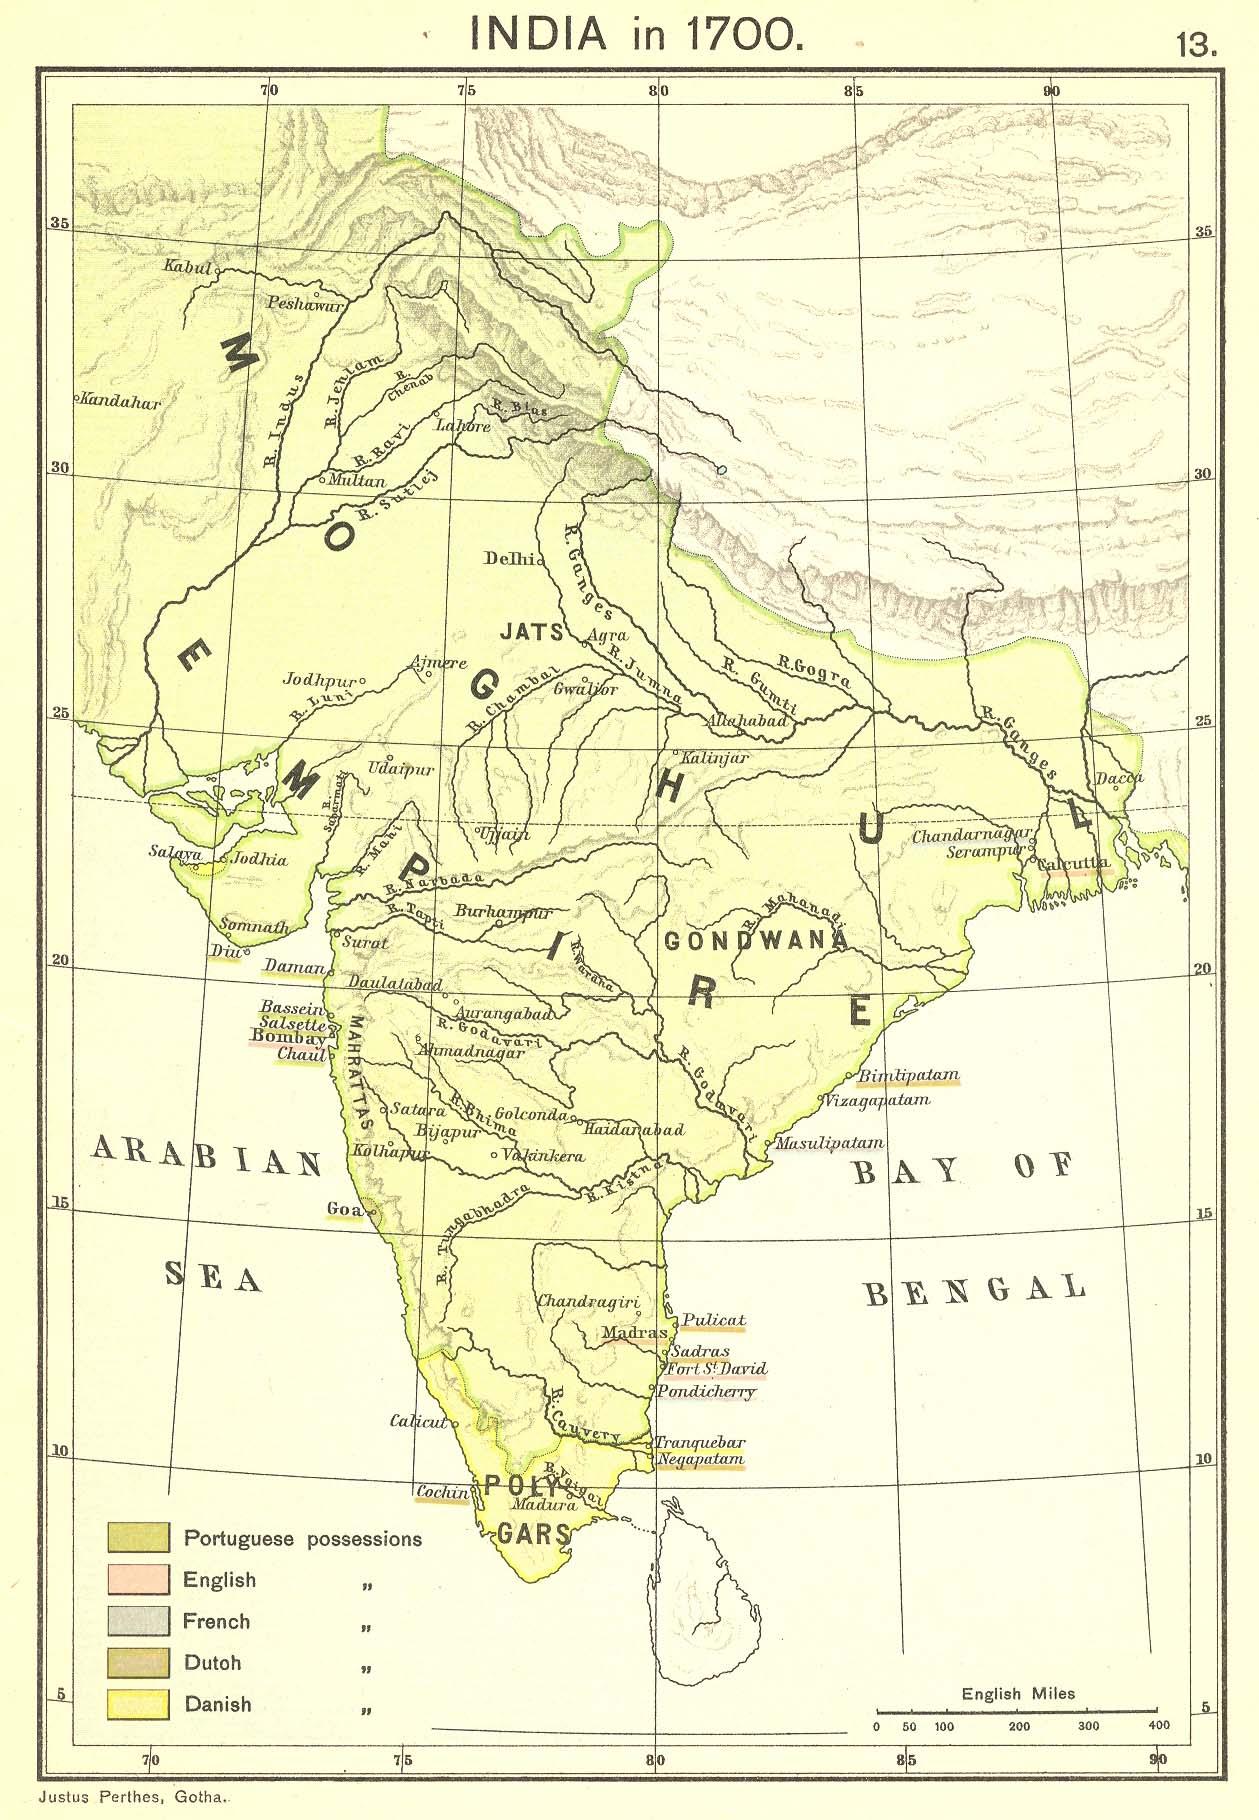 india-in-1700-joppen